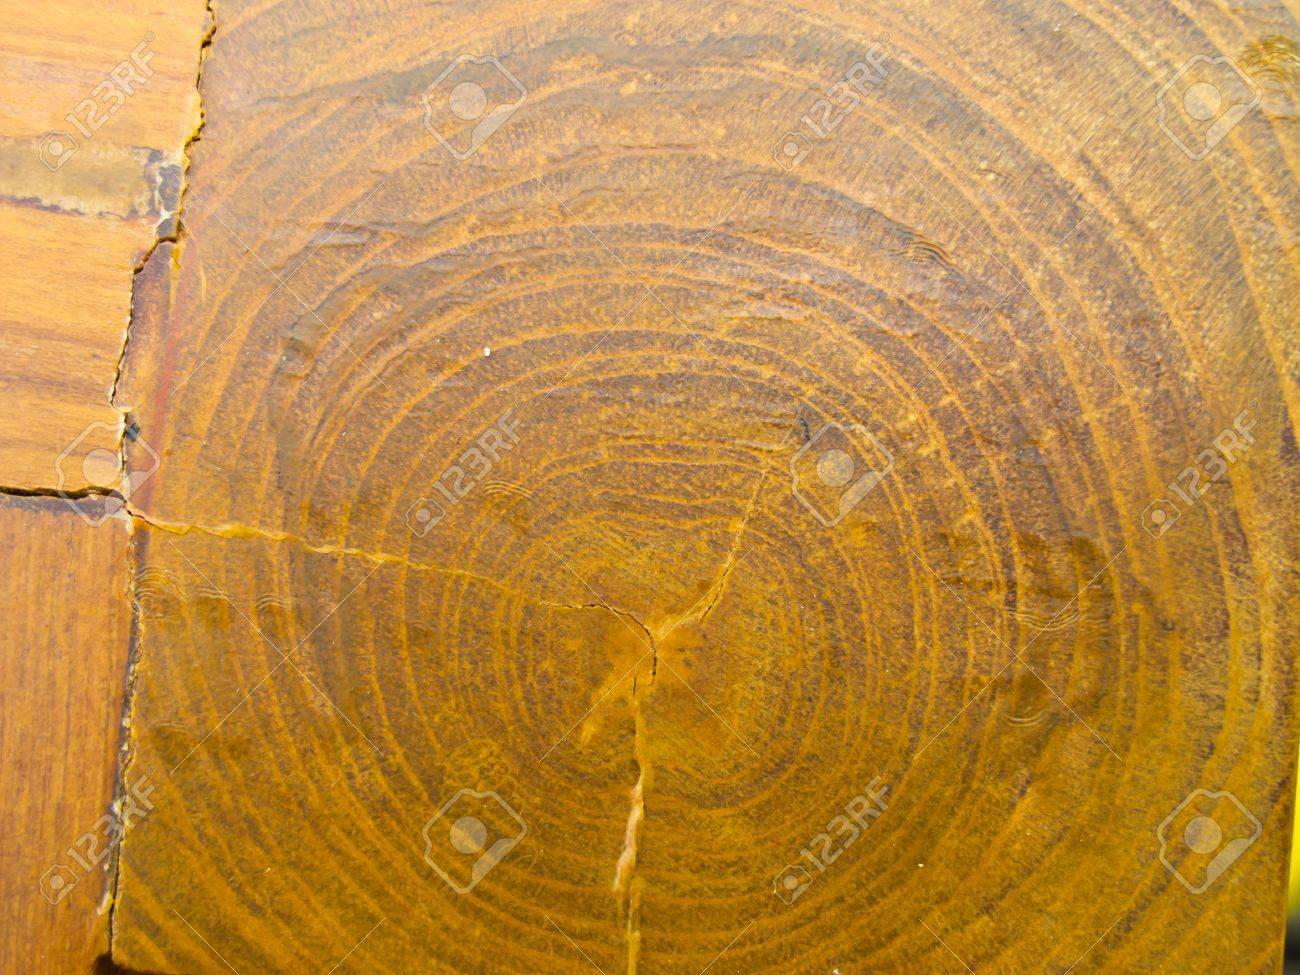 A fake wood grain textured cabinet laminate Stock Photo - 20695044